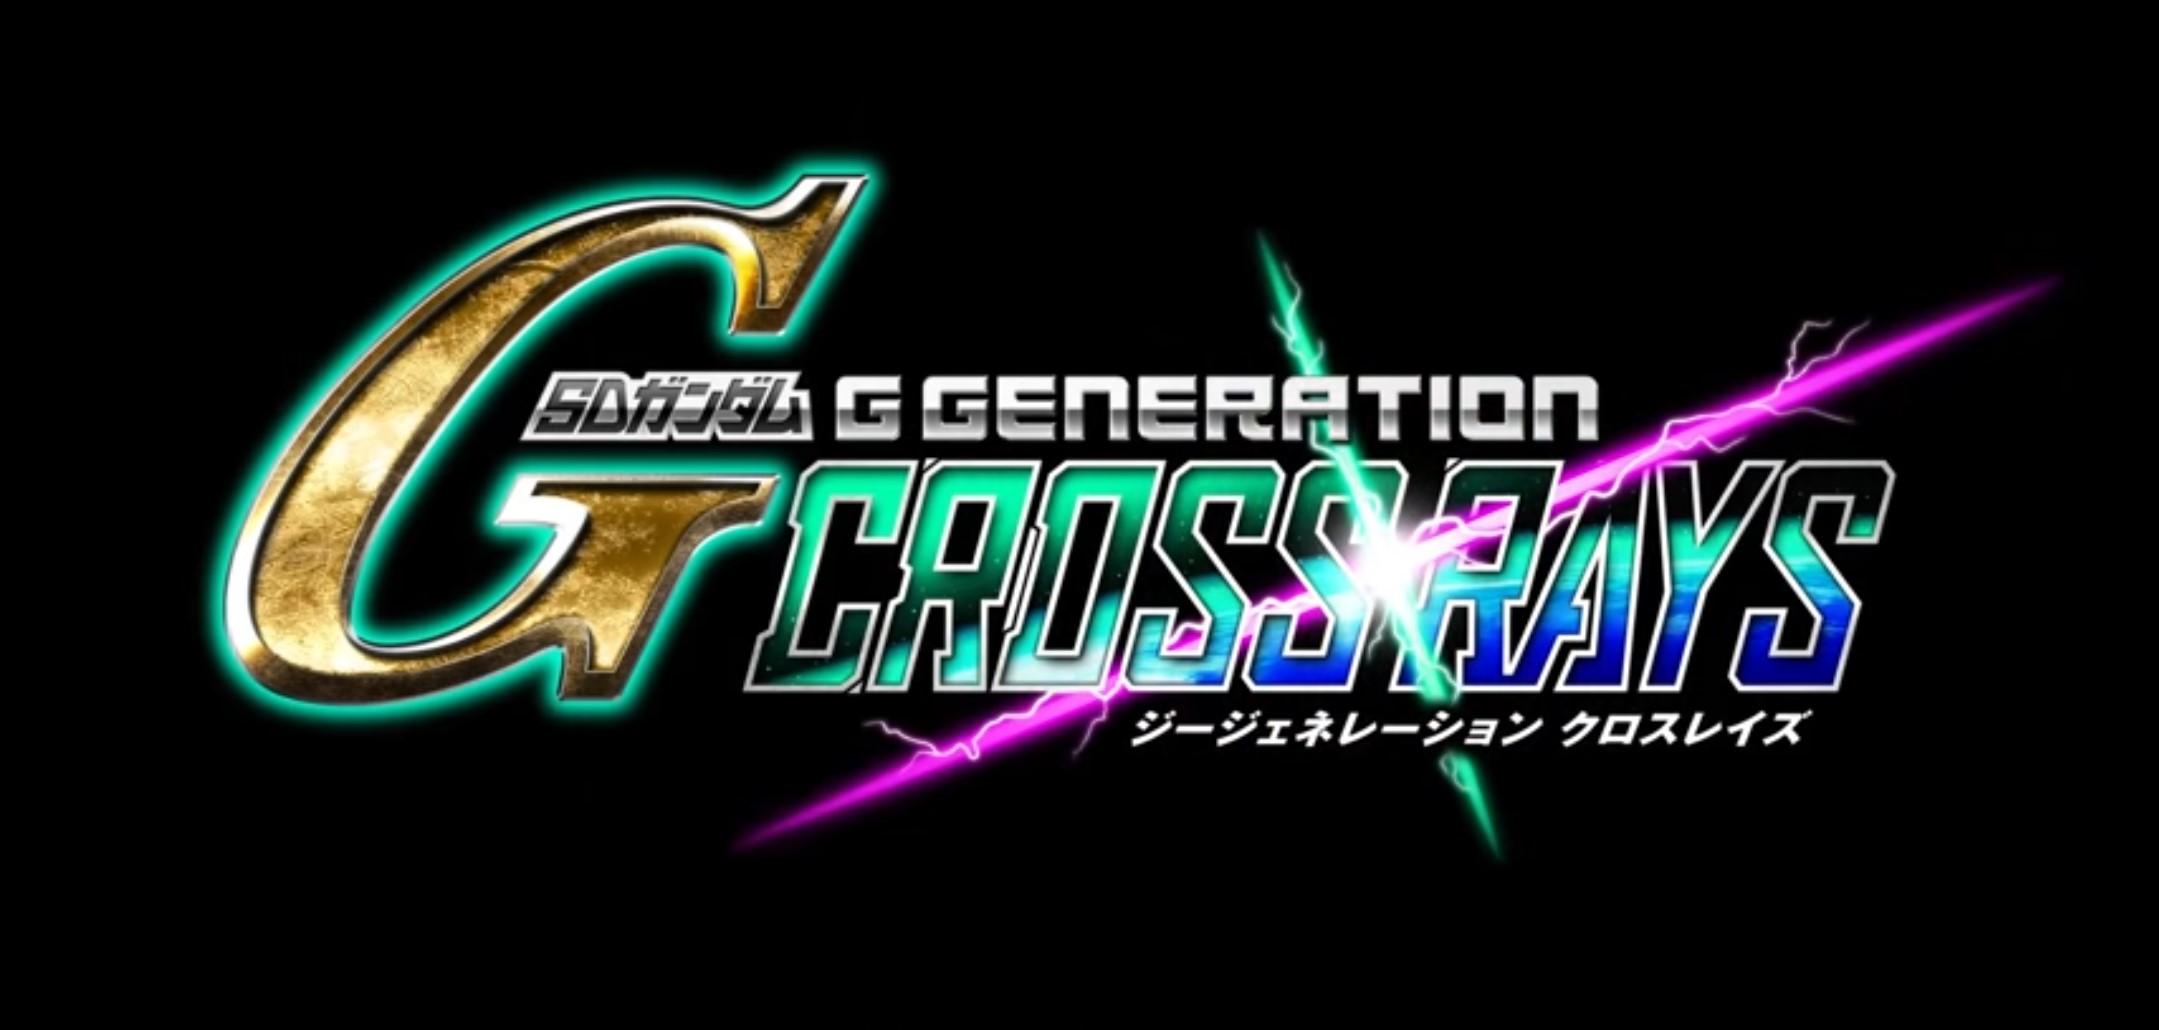 SD Gundam G Generation Cross Rays reunites Japan with old friends on November 28 screenshot